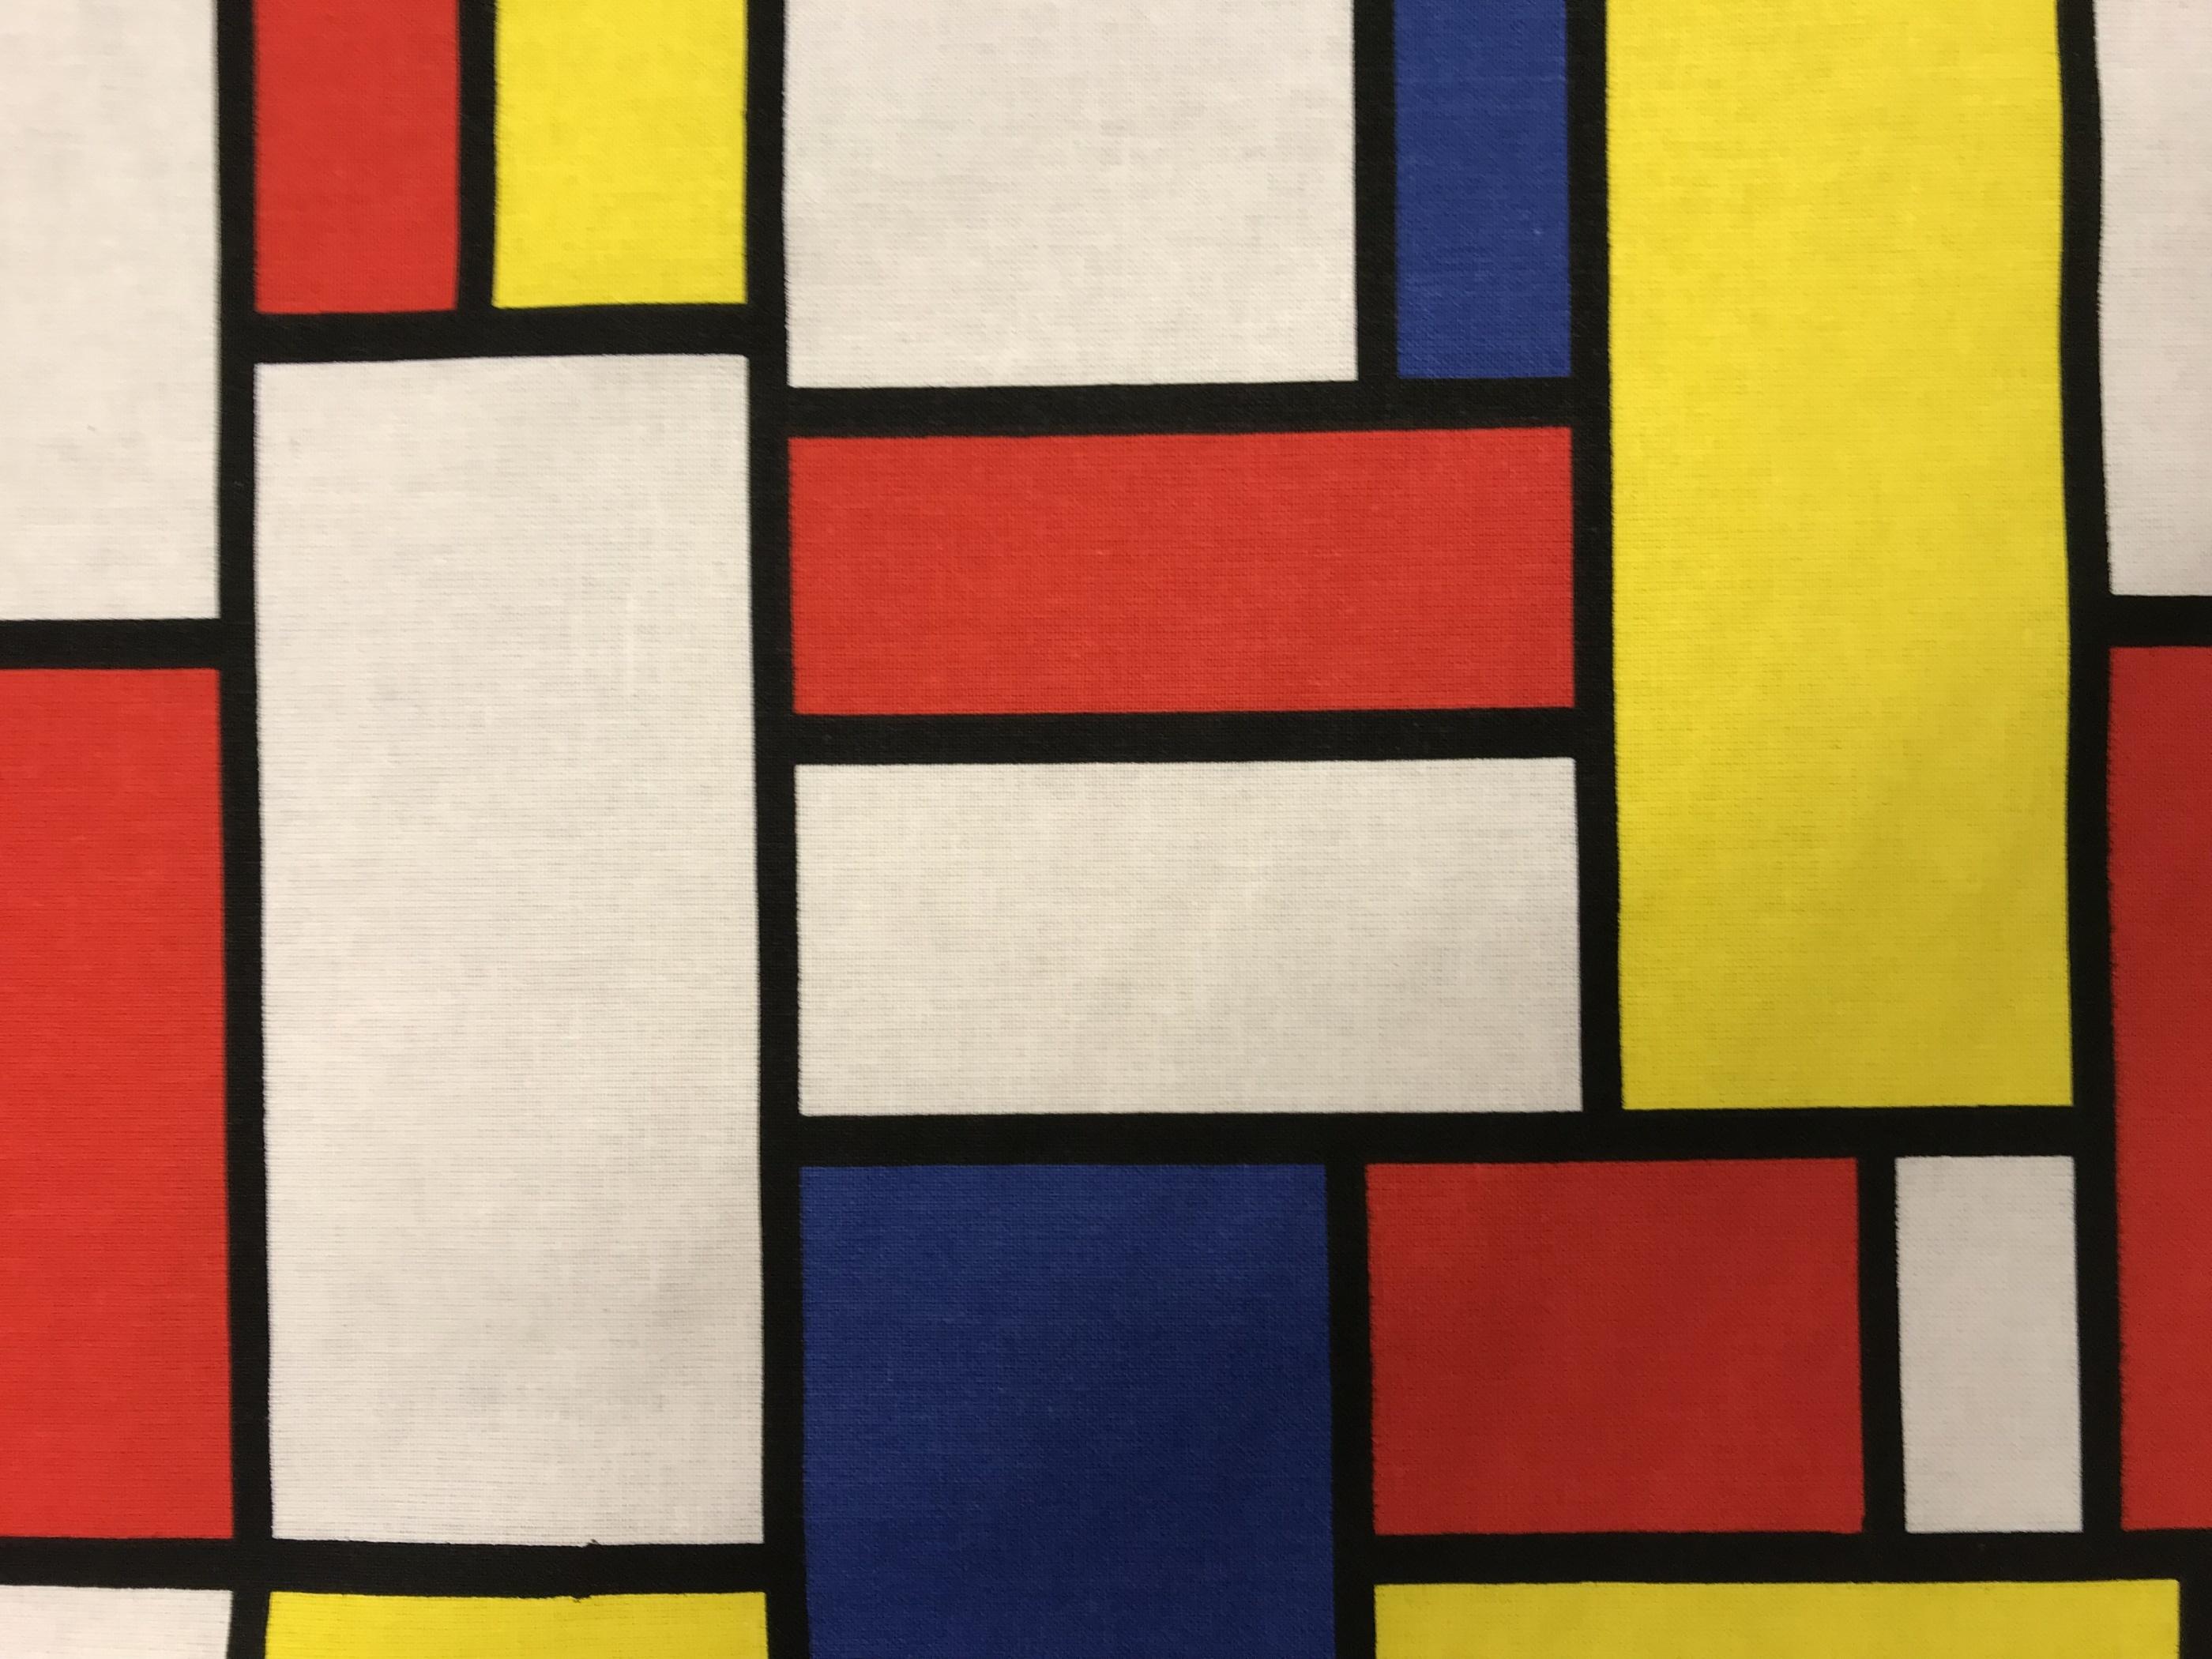 mondrian konst metervara tyg grafiskt gul blå röd vit hemtextil mode